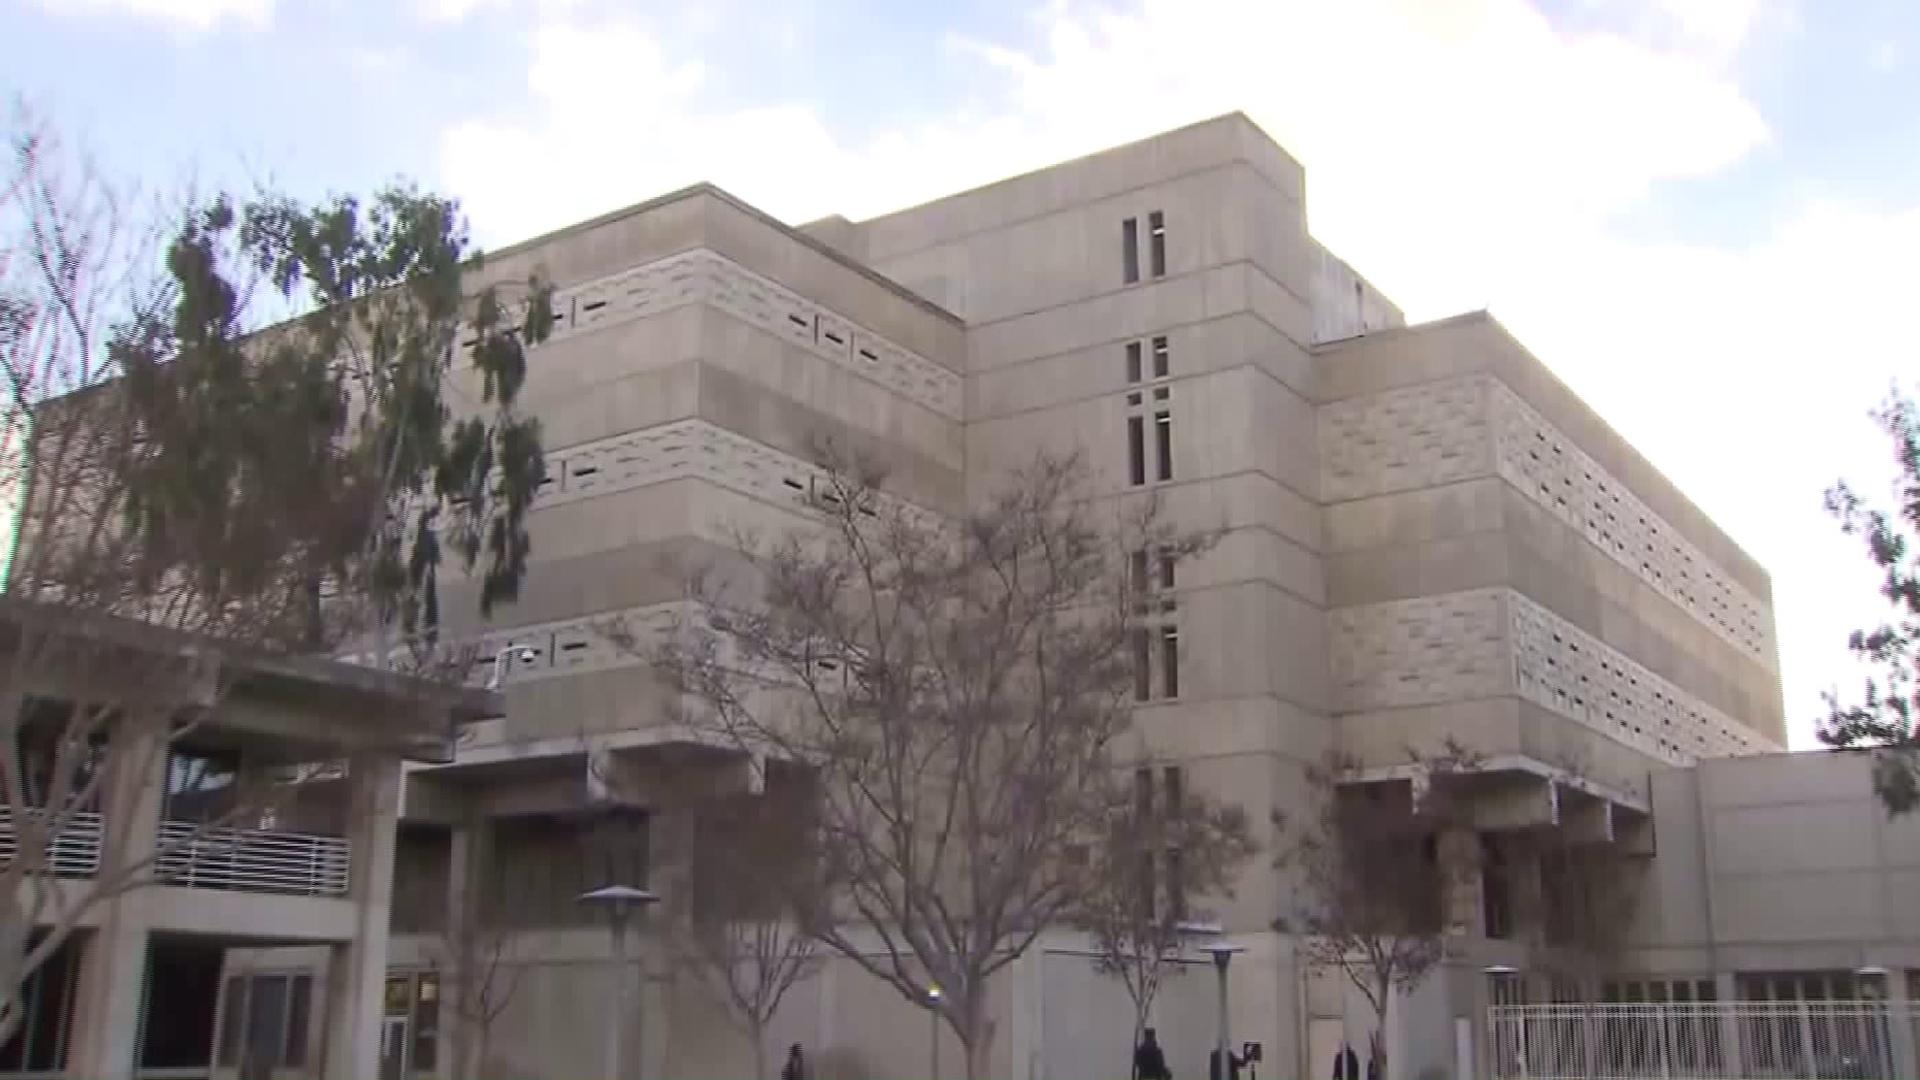 The Orange County Central Men's Jail in Santa Ana is seen on Jan. 23, 2016. (Credit: KTLA)